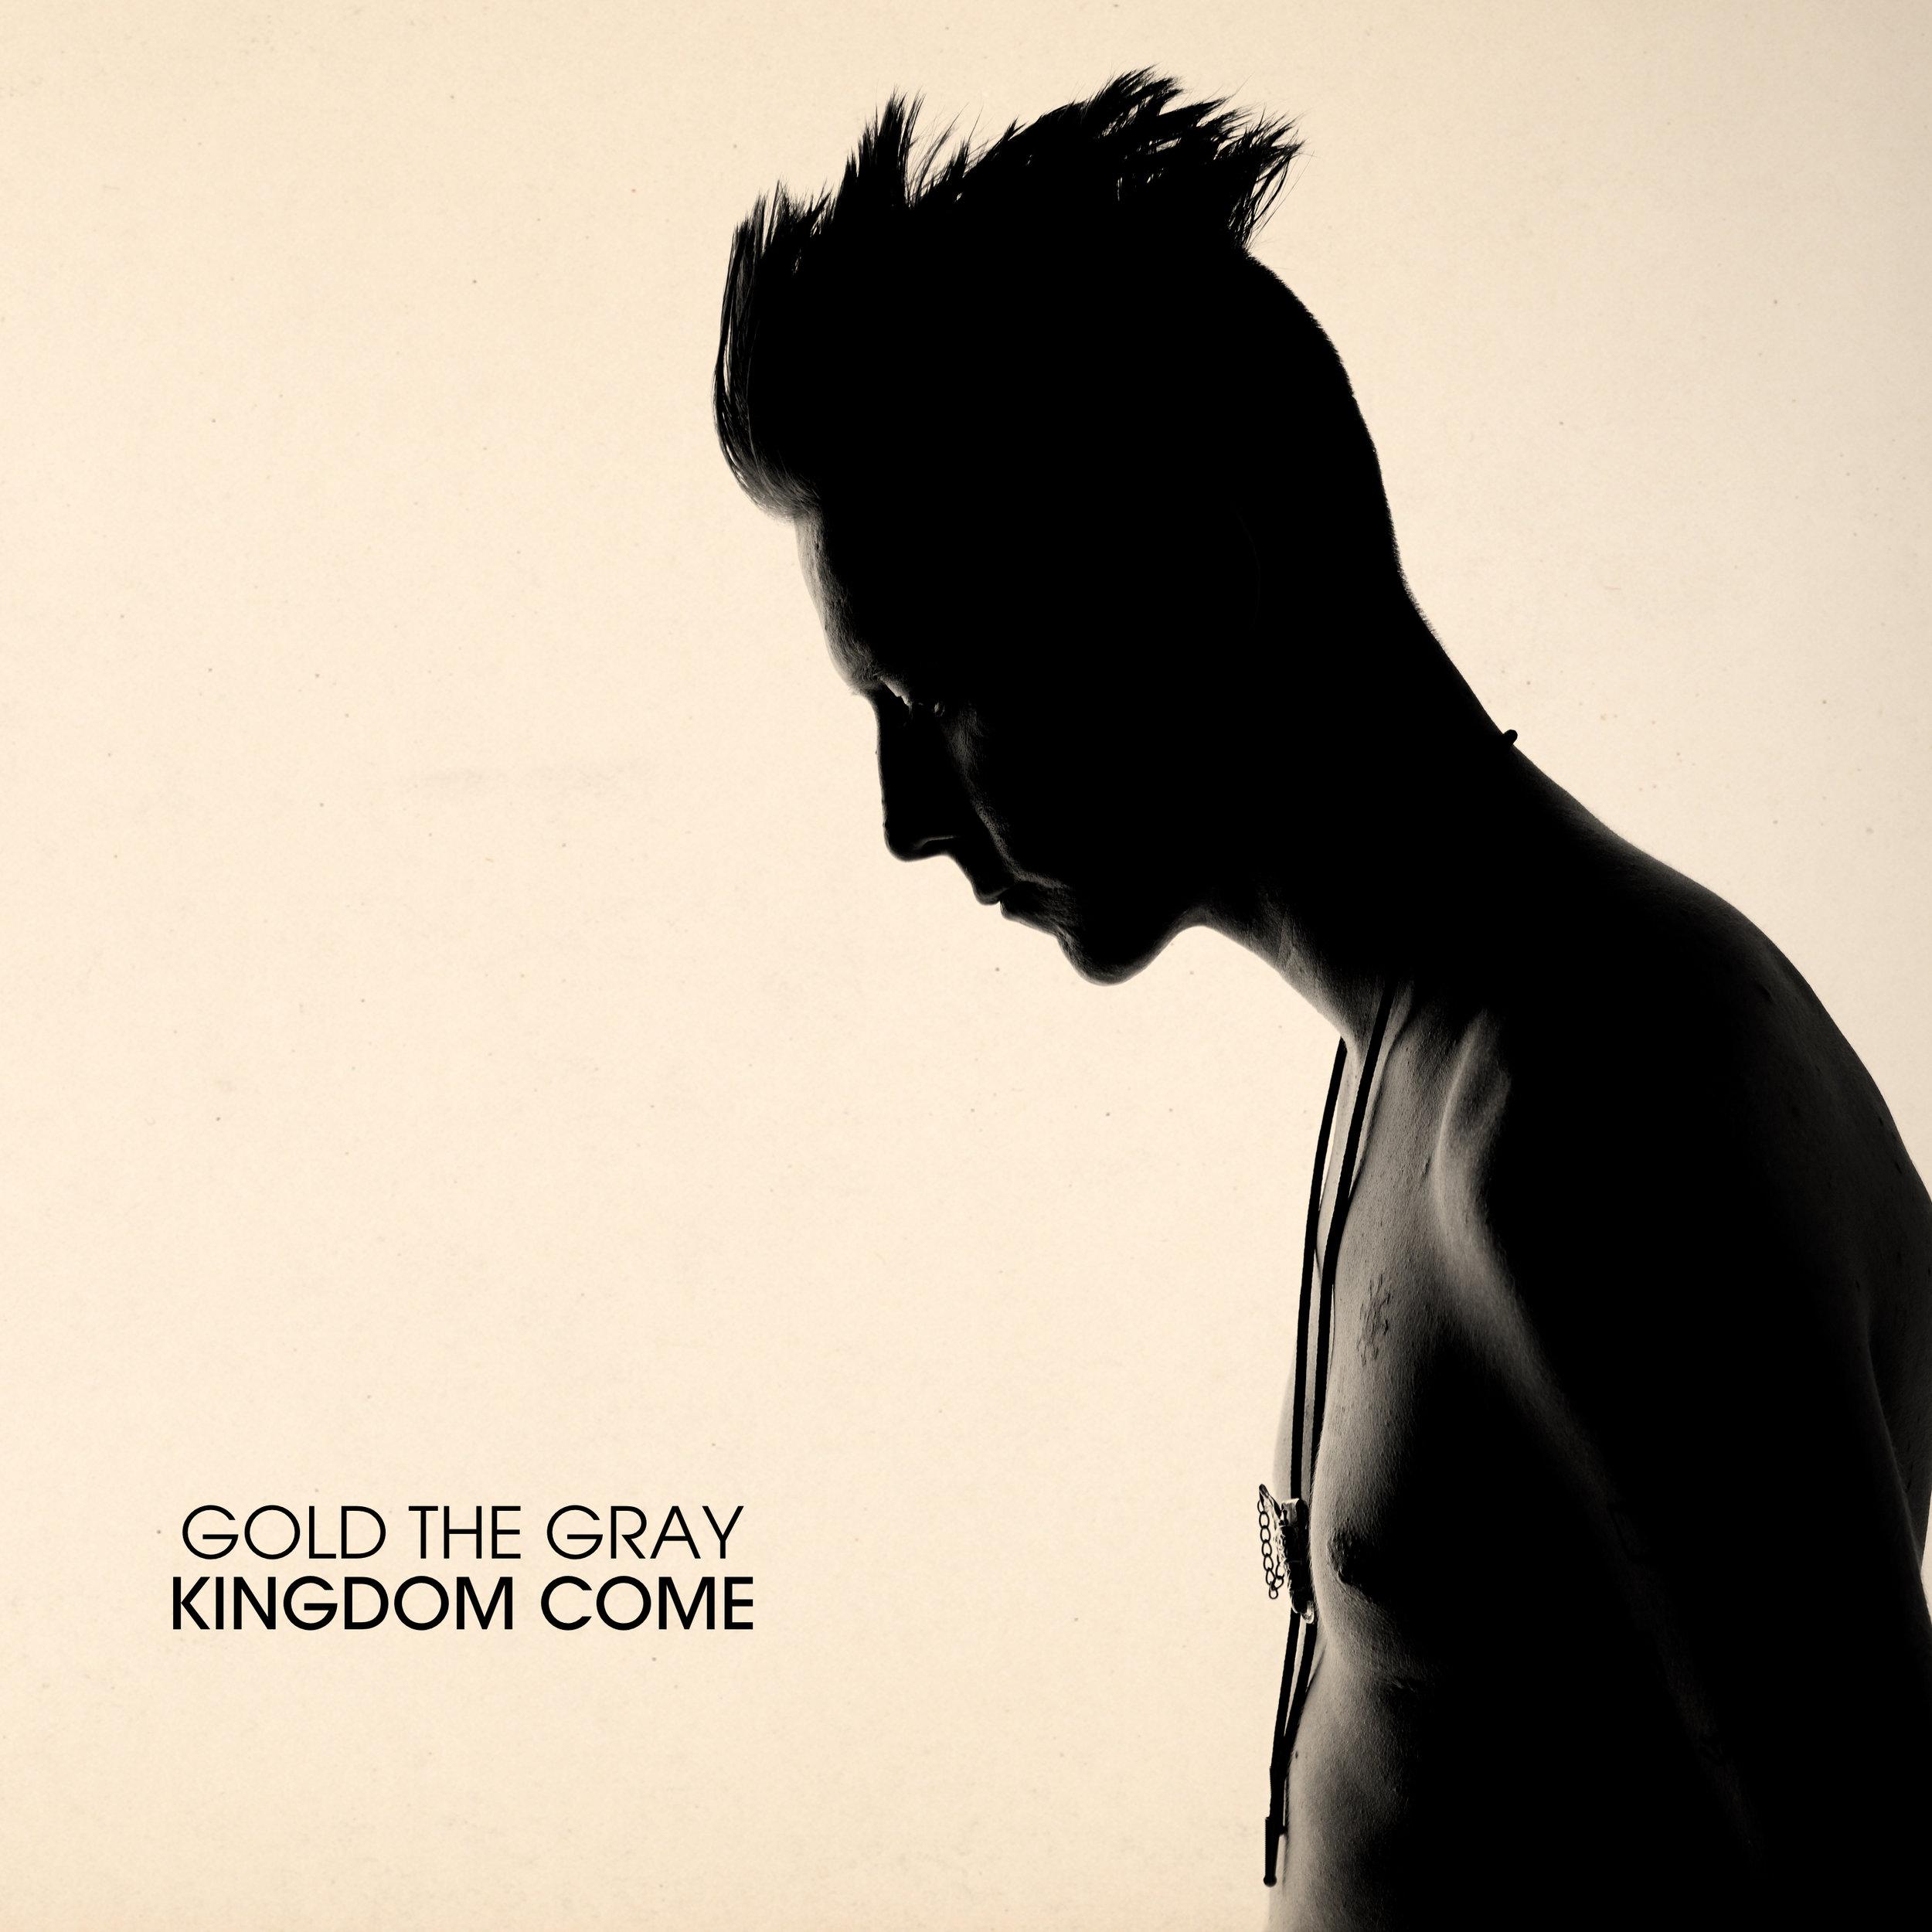 goldthegray_1.jpg